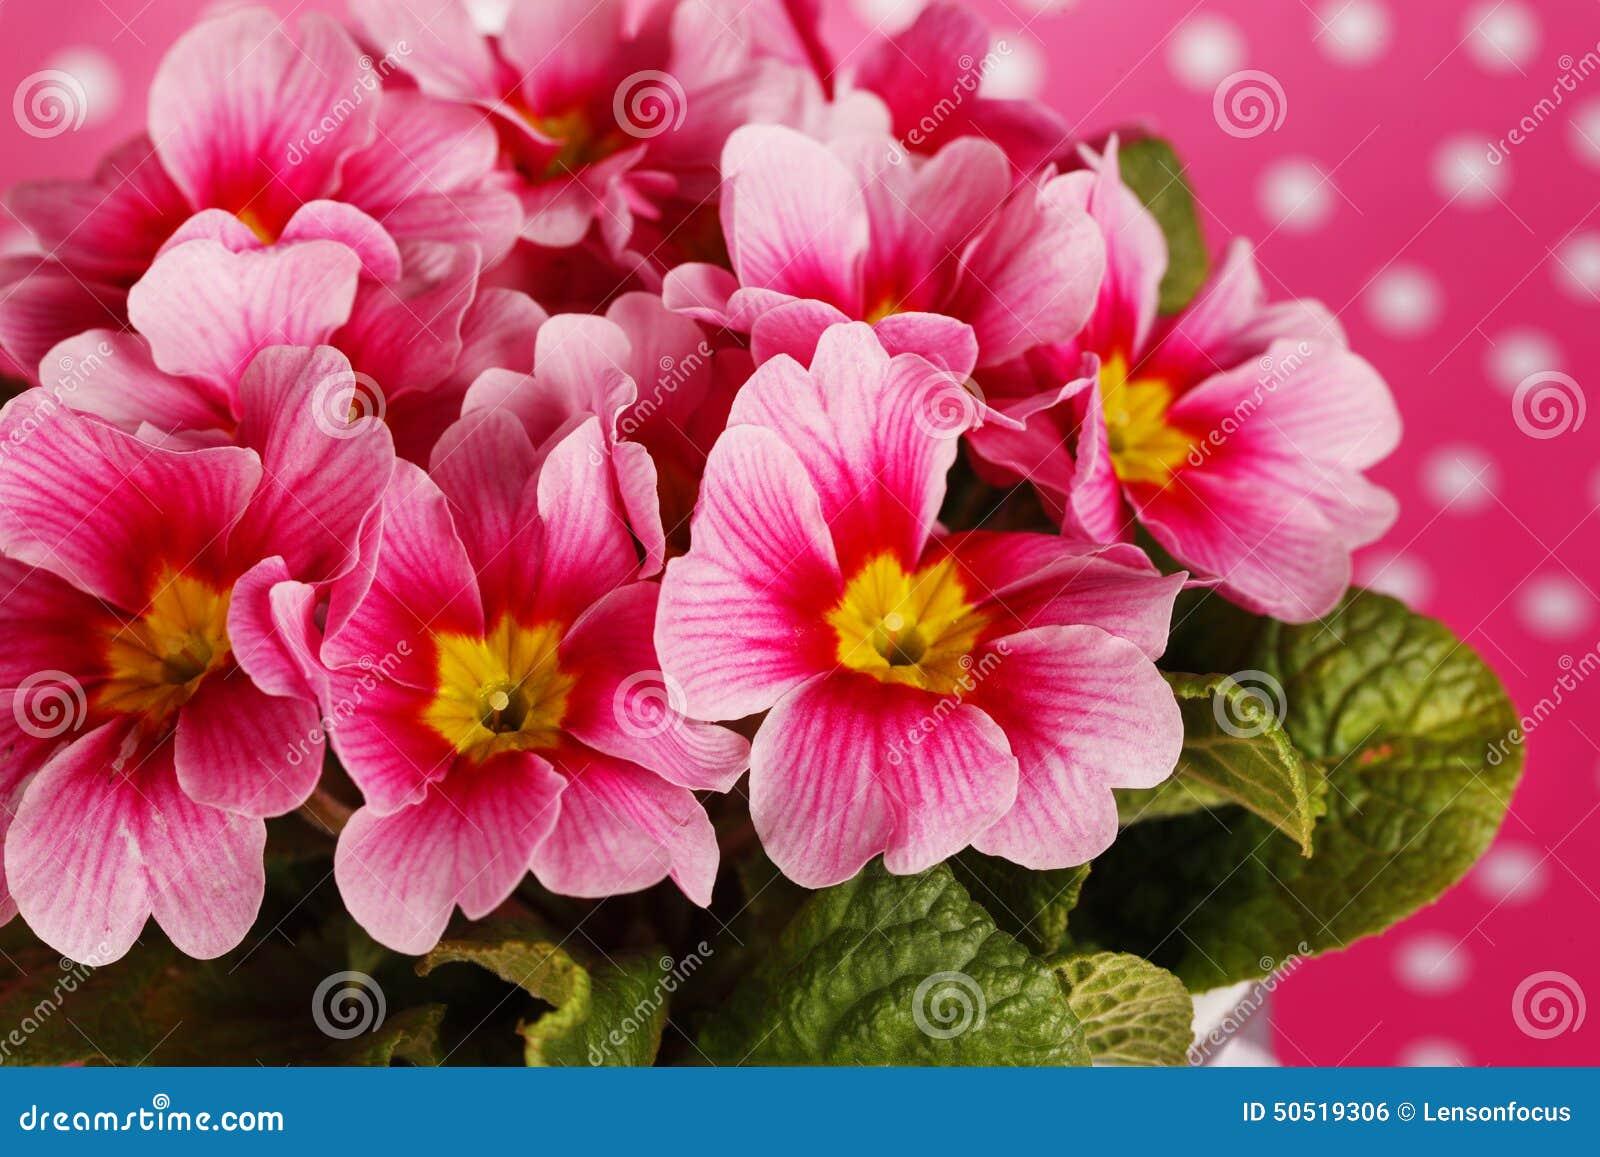 Pink primrose flowers stock photo image of romantic 50519306 pink primrose flowers mightylinksfo